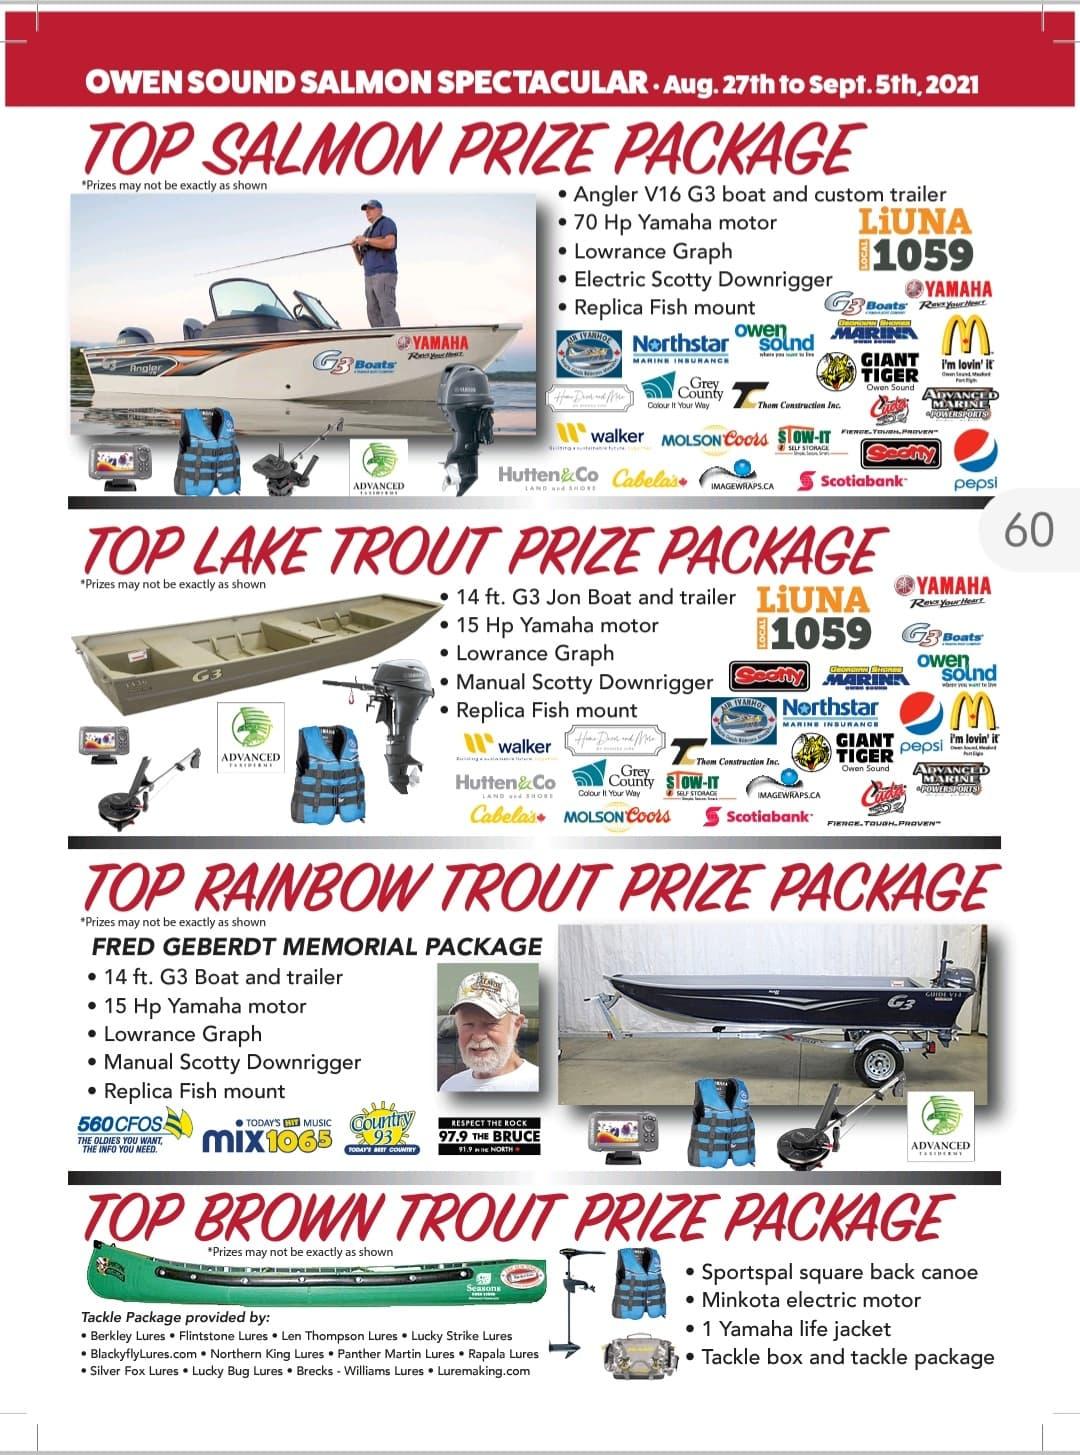 Salmon Spectacular prizes